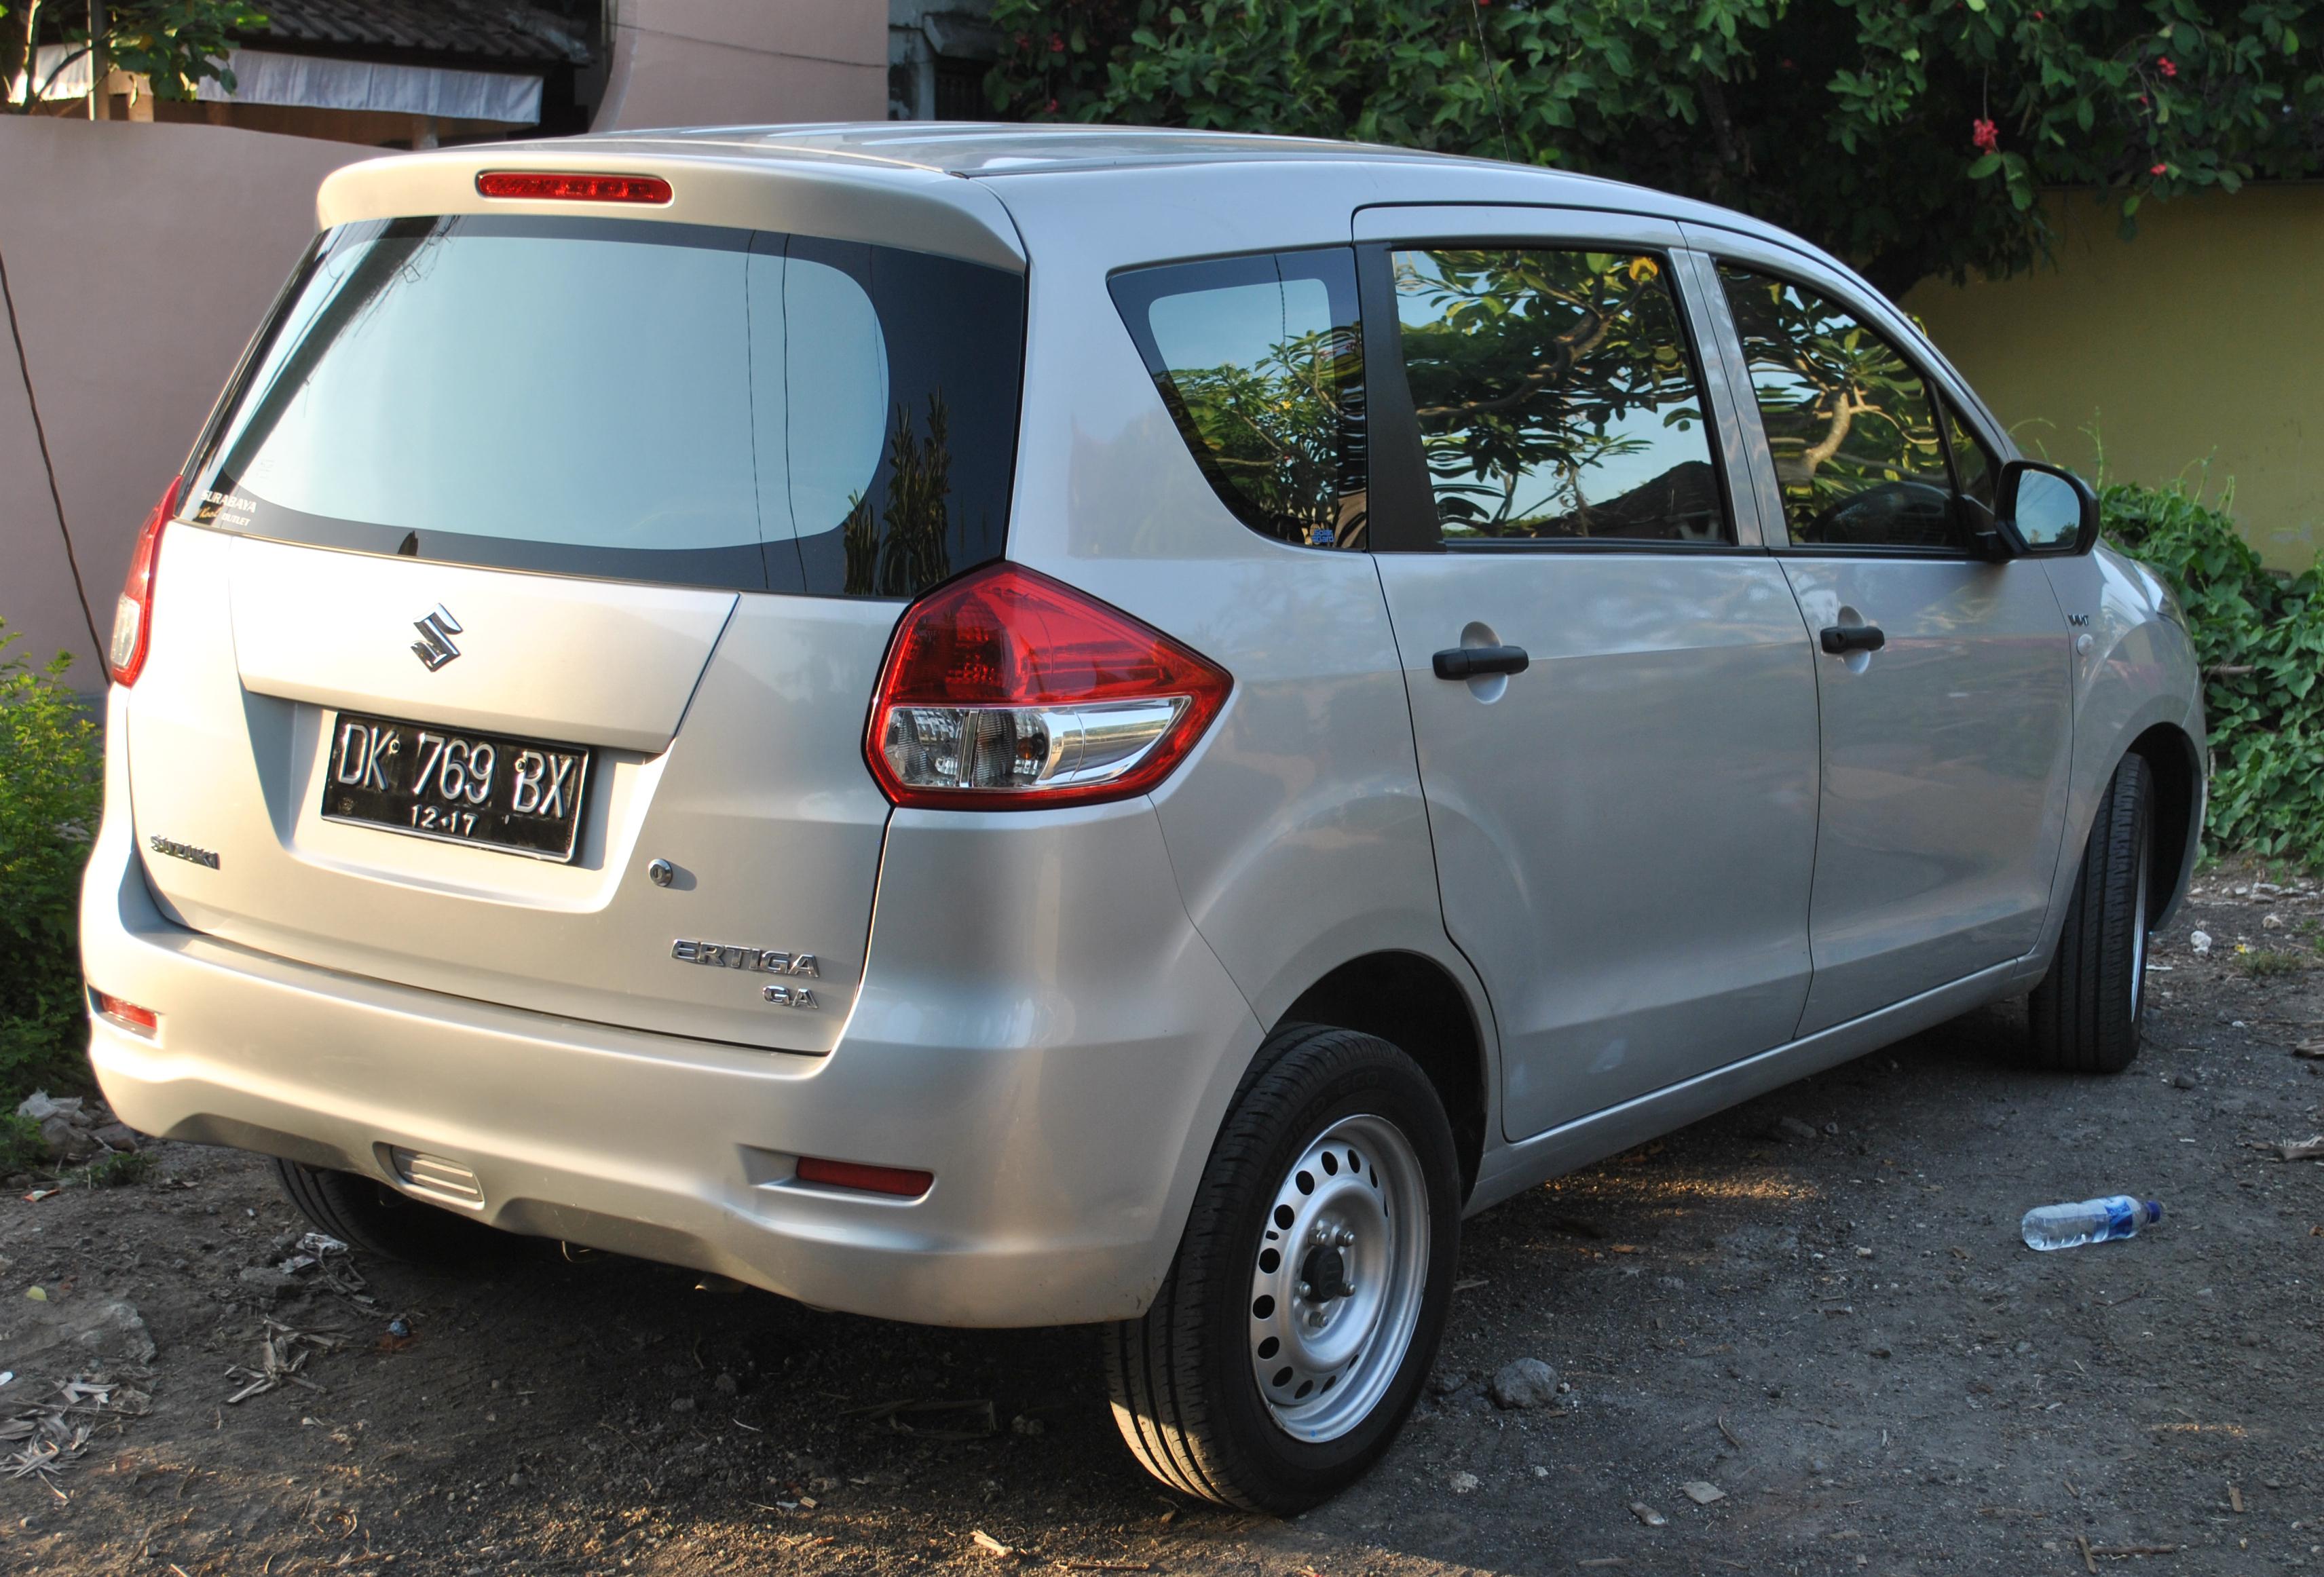 File:Suzuki Ertiga GA rear.jpg - Wikimedia Commons